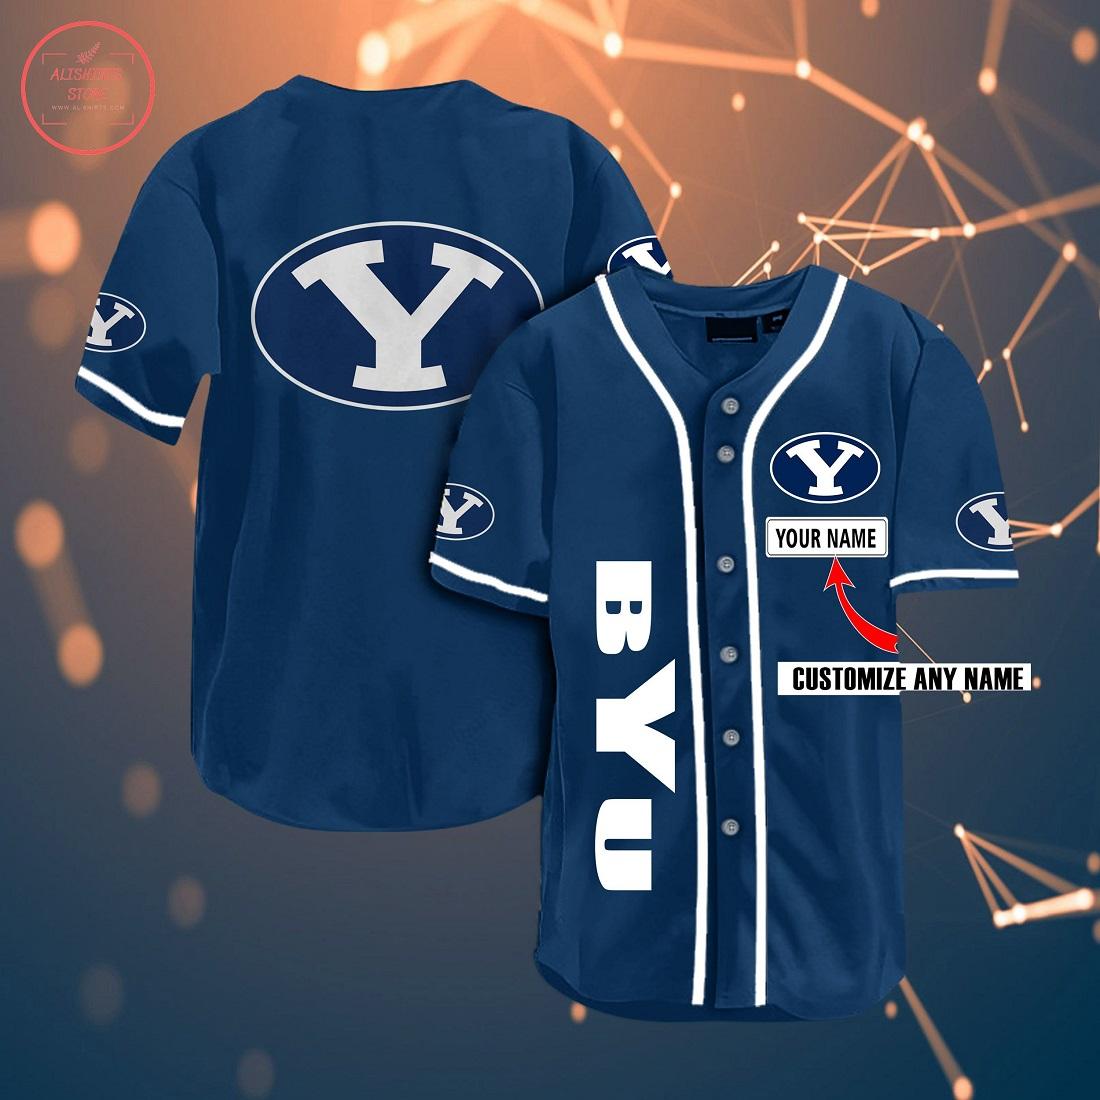 Ncaa Byu Cougars Personalized Baseball Jersey